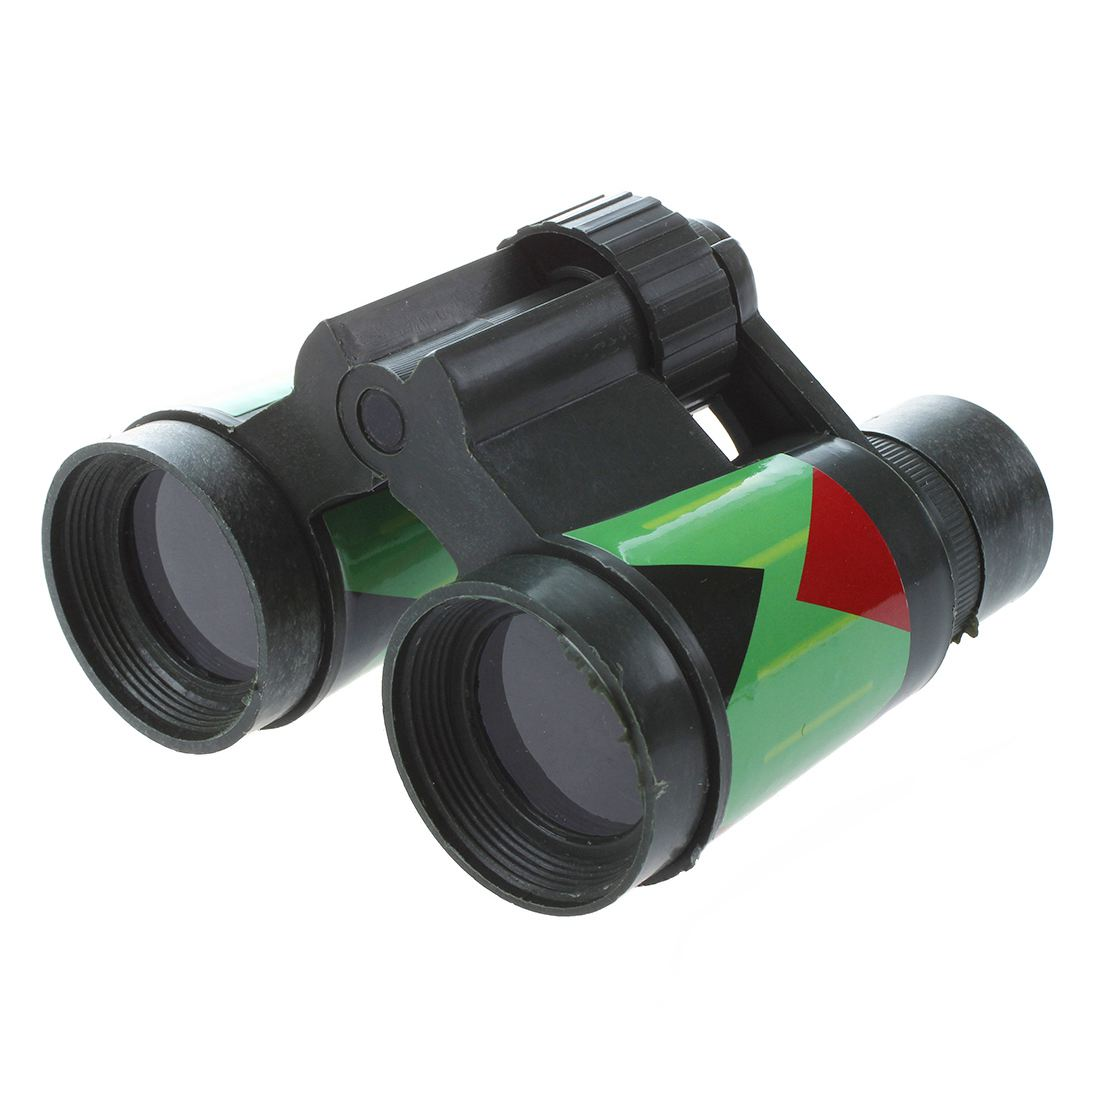 SODIAL(R) ArmyGreen Plastic 10 X 30mm Binocular Toy For Child Kids